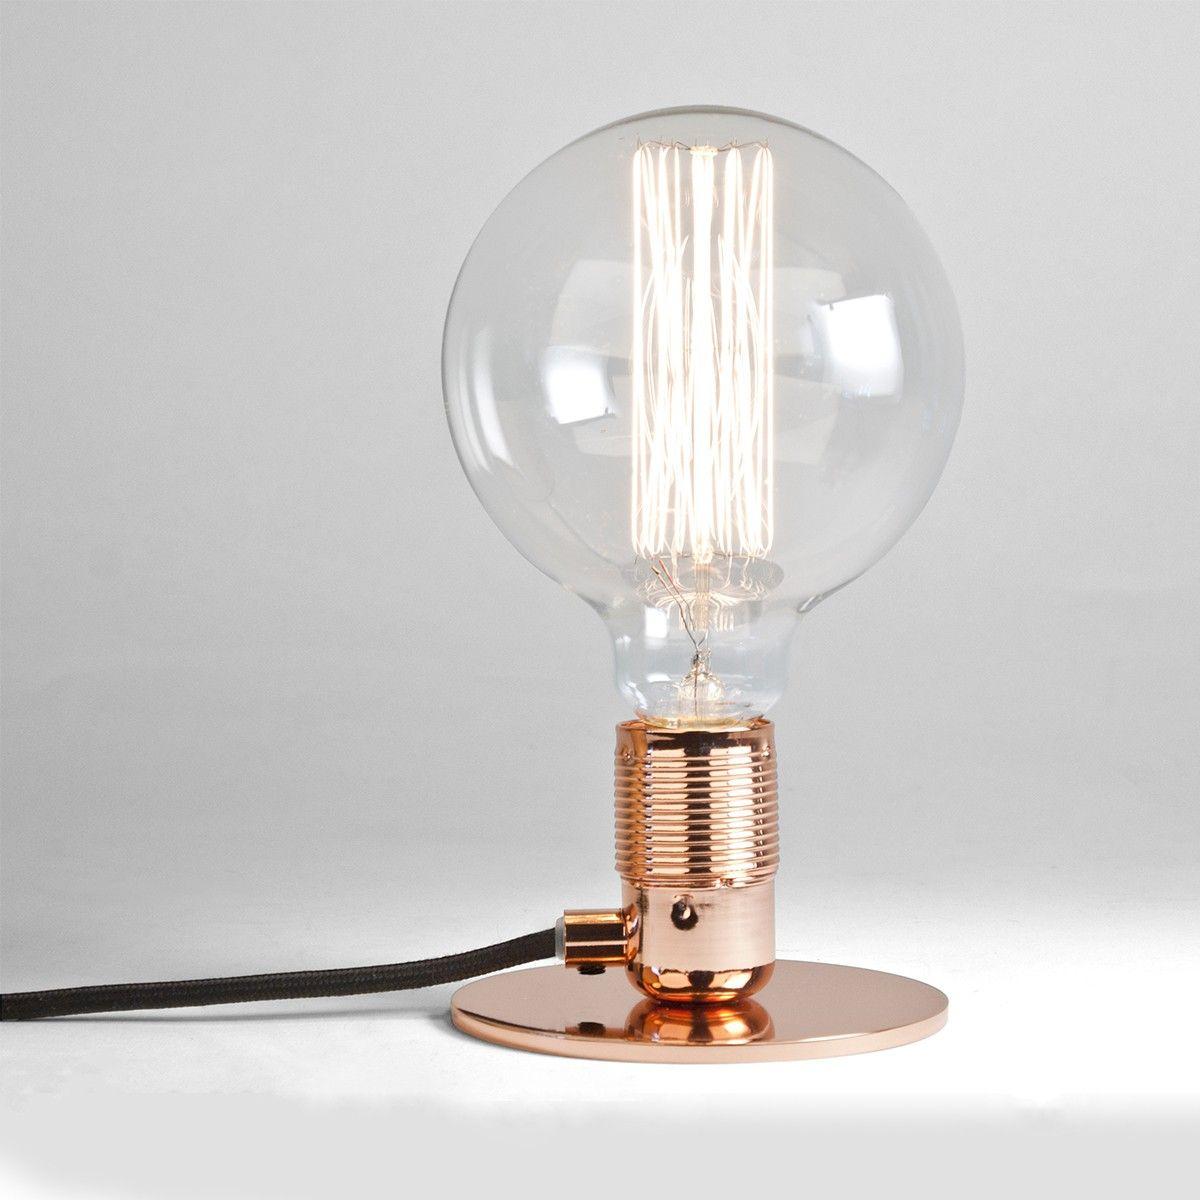 Lampe 224 Poser Frama Cuivre Lamp Lampes De Table Lampe 224 Poser